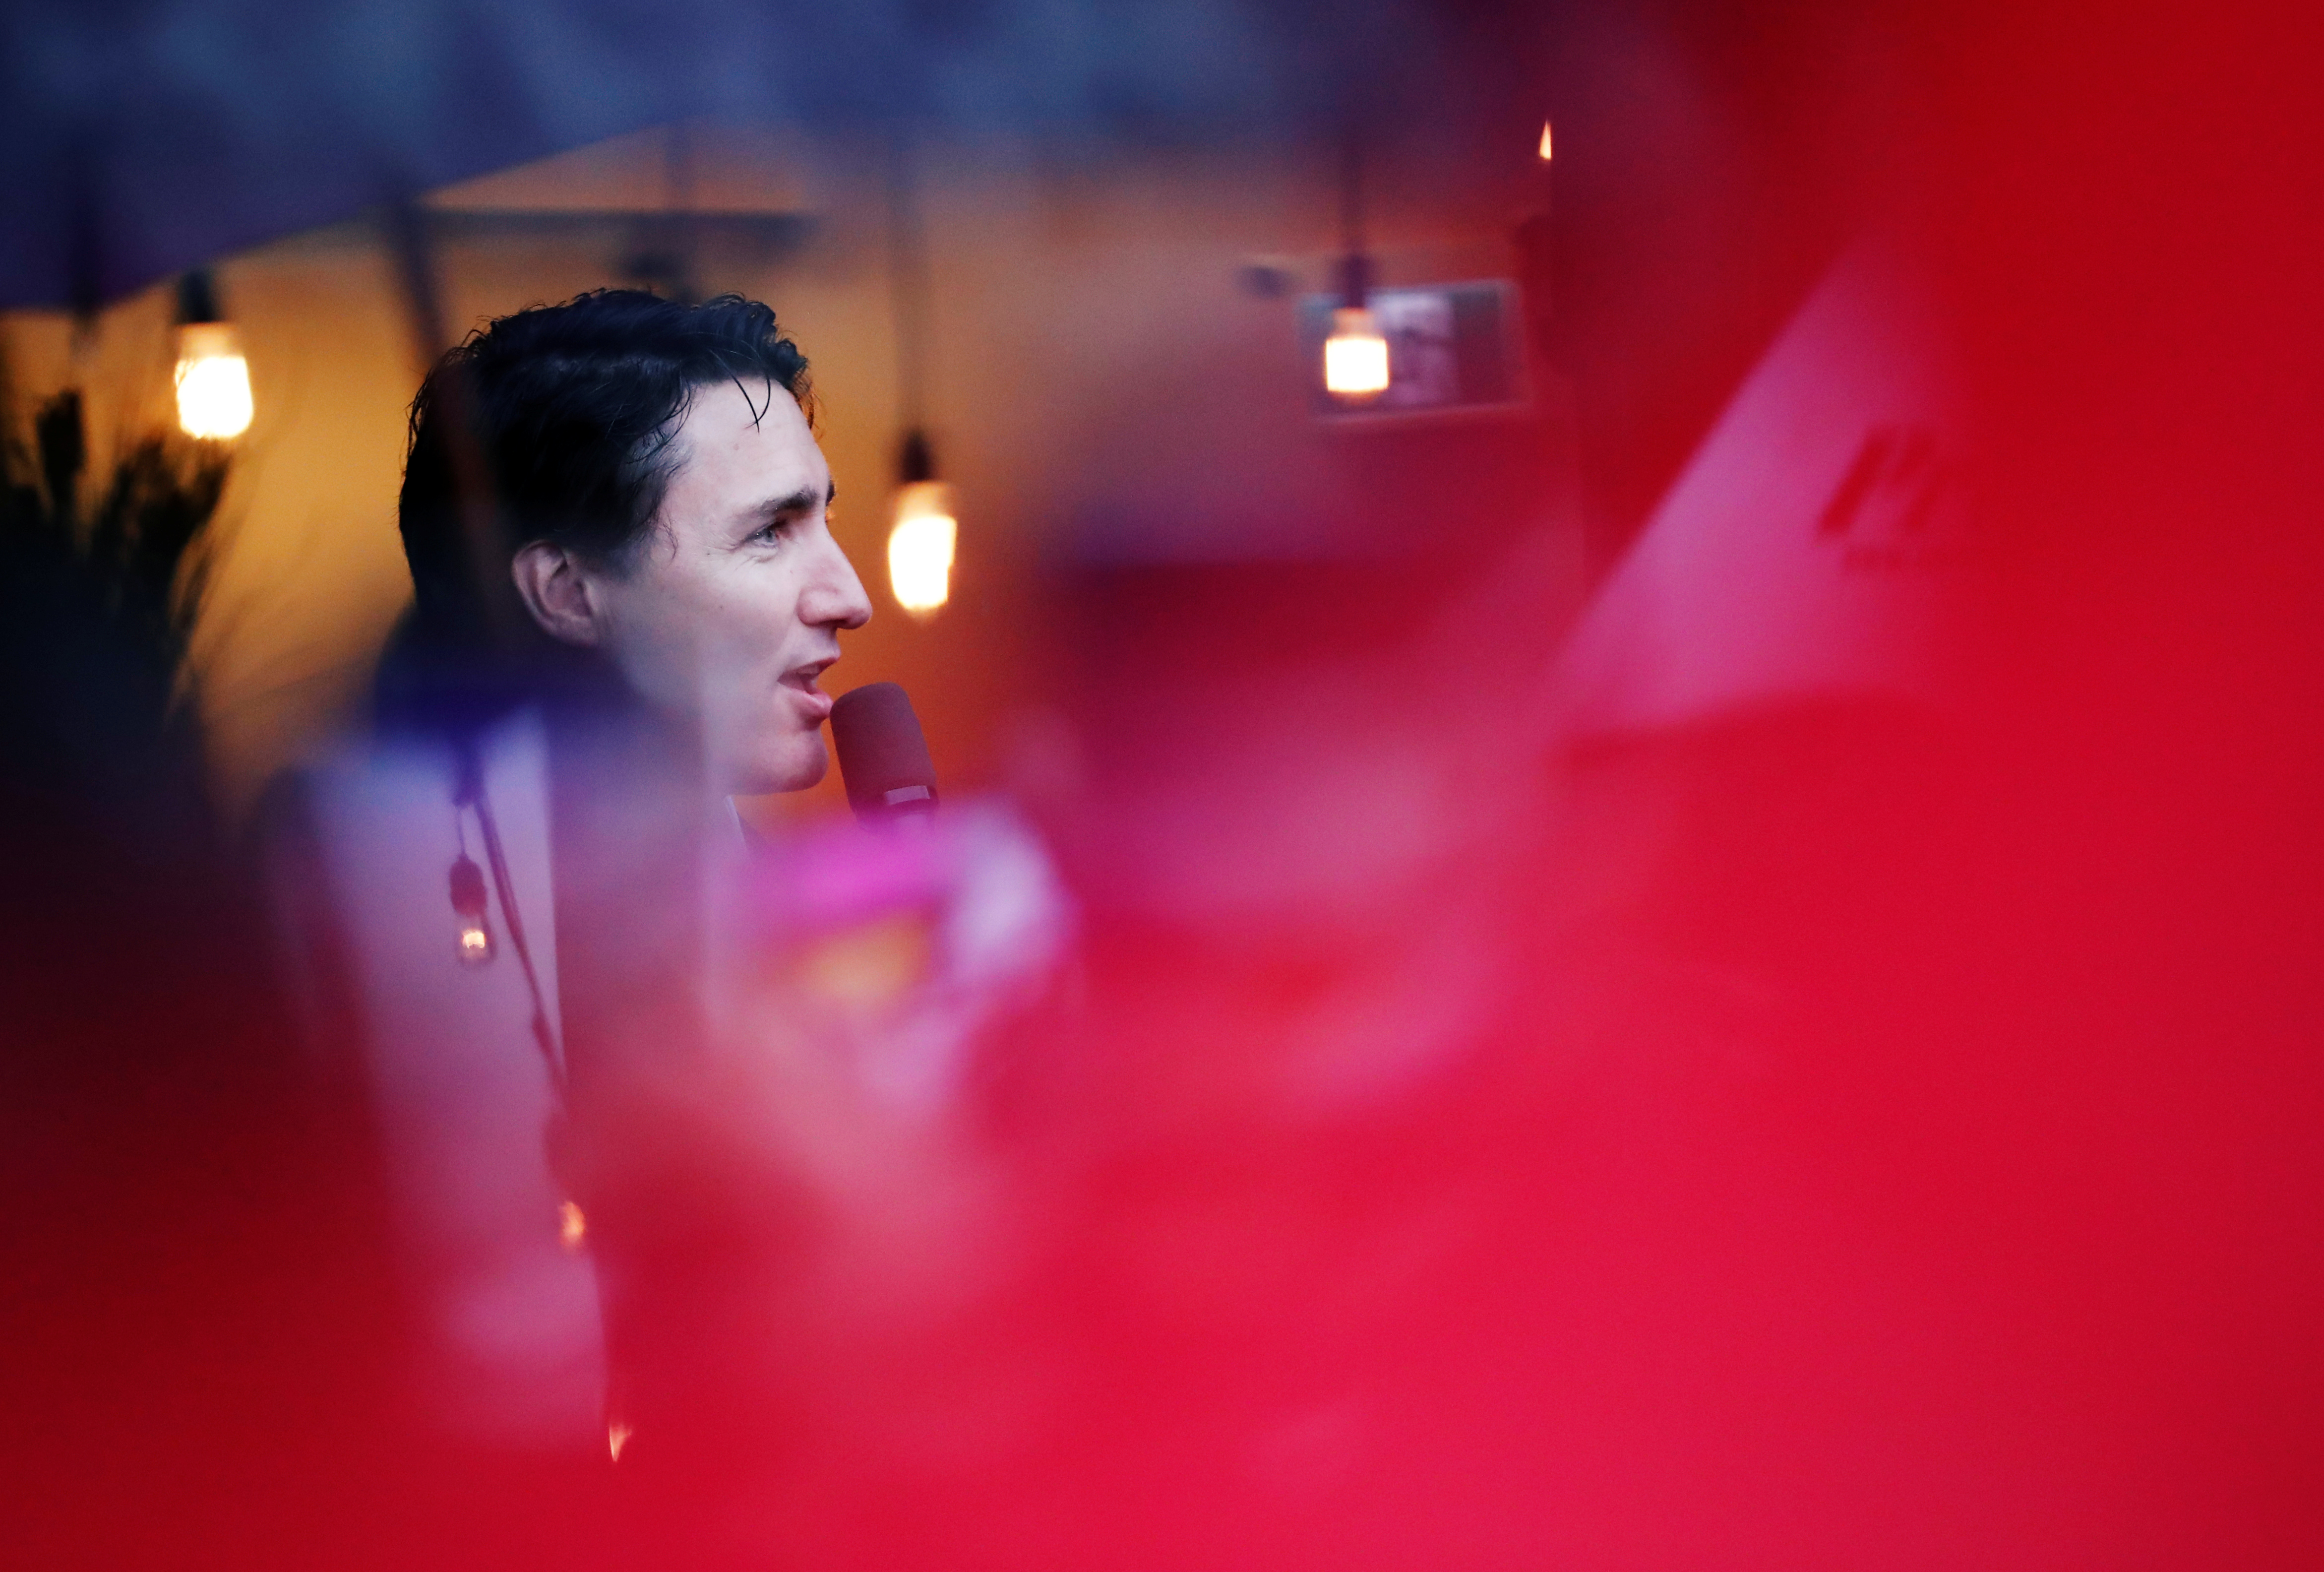 Battered Trudeau team sees sign of Canadian election hope after scandals